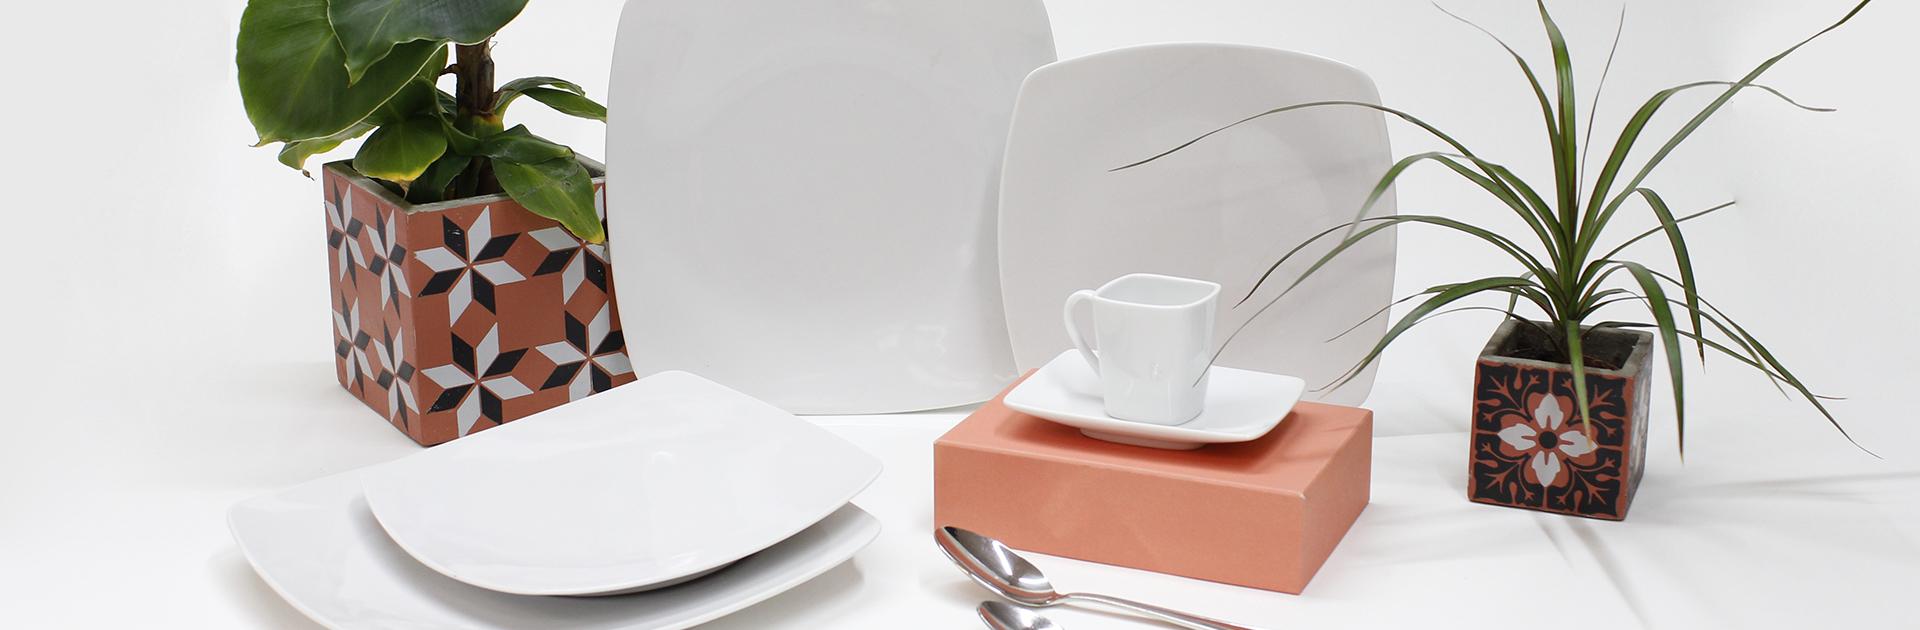 Location vaisselle Cholet - 100% LOC